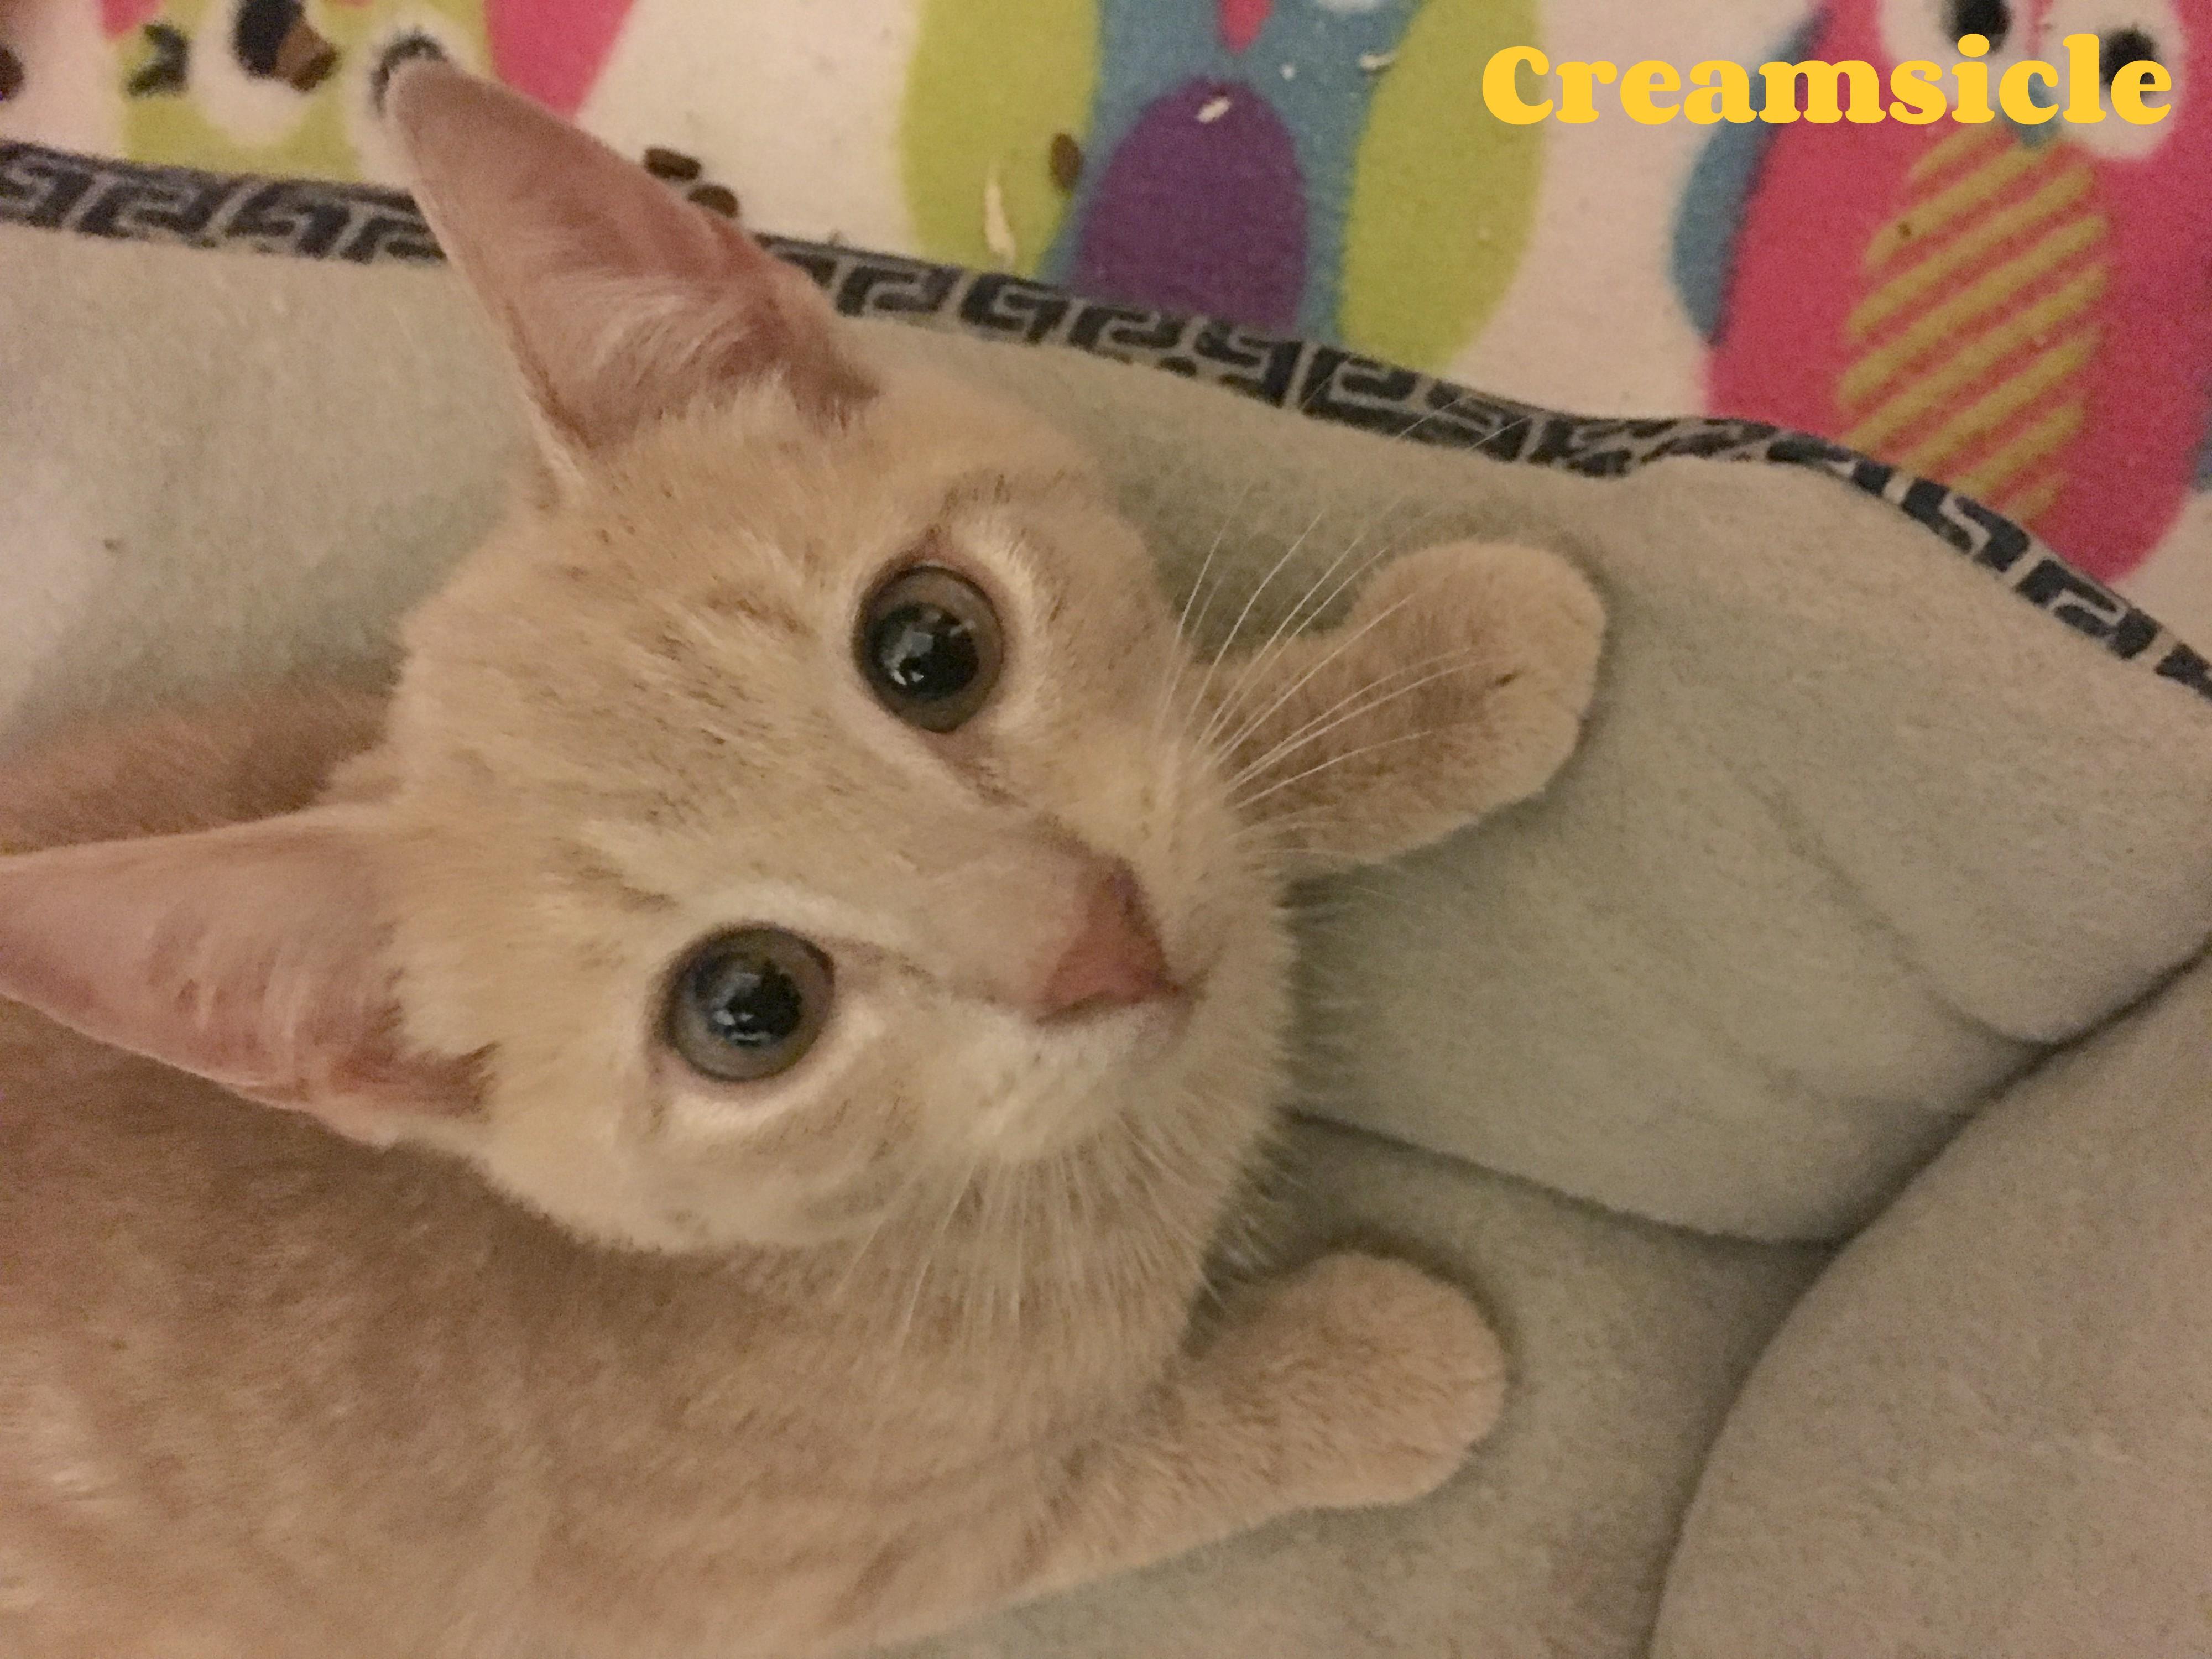 Creamsicle :